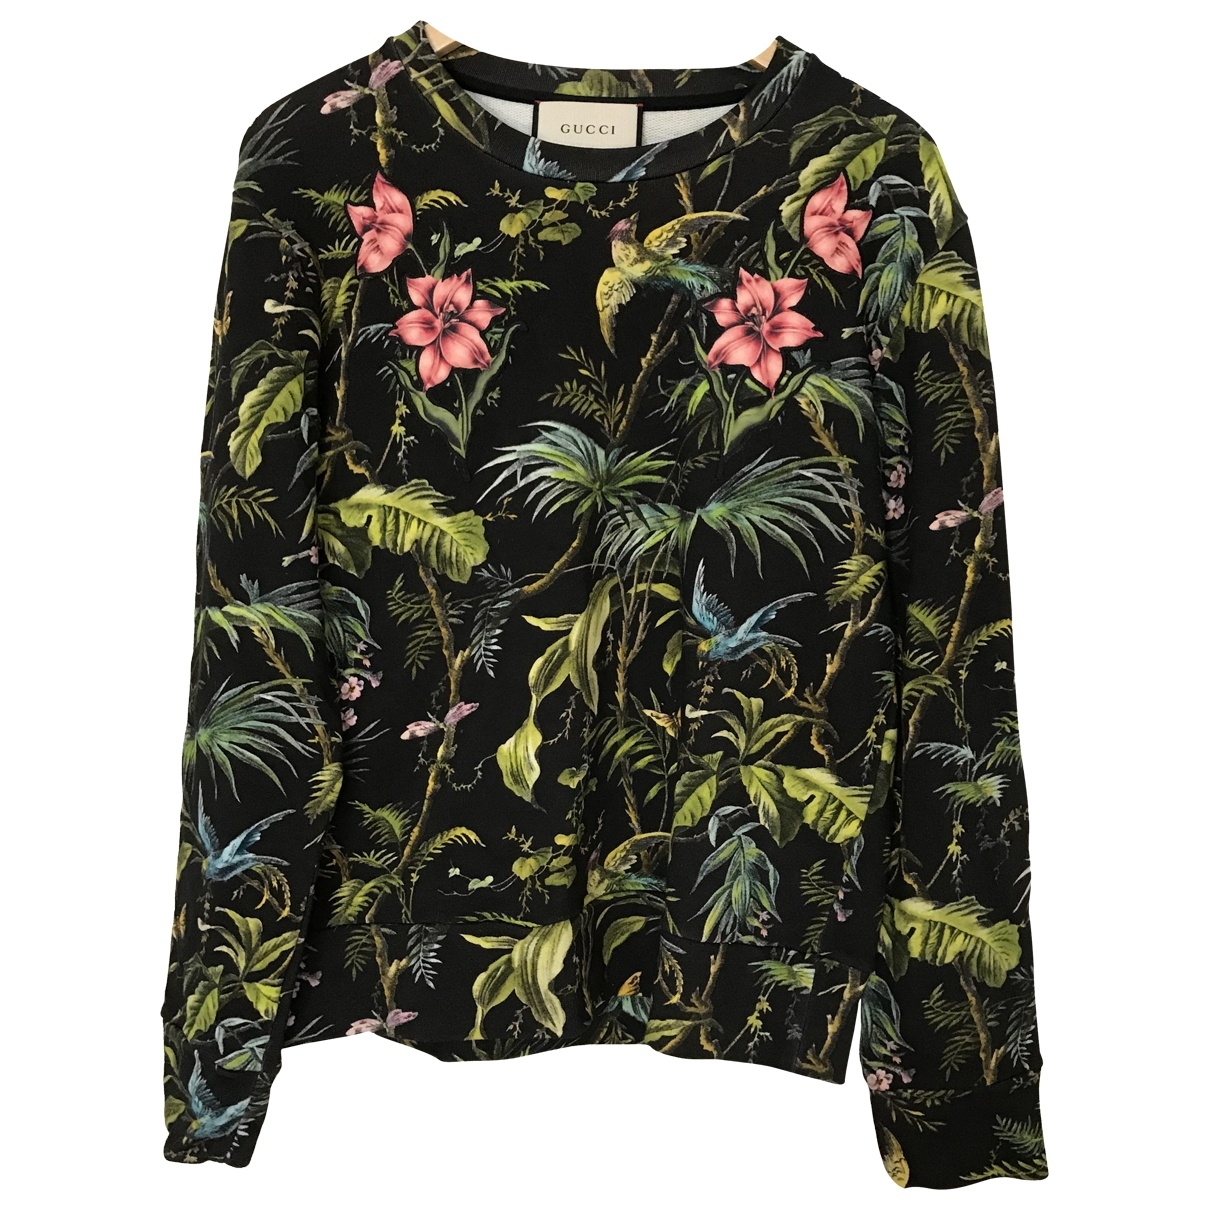 Gucci \N Green Cotton Knitwear & Sweatshirts for Men S International